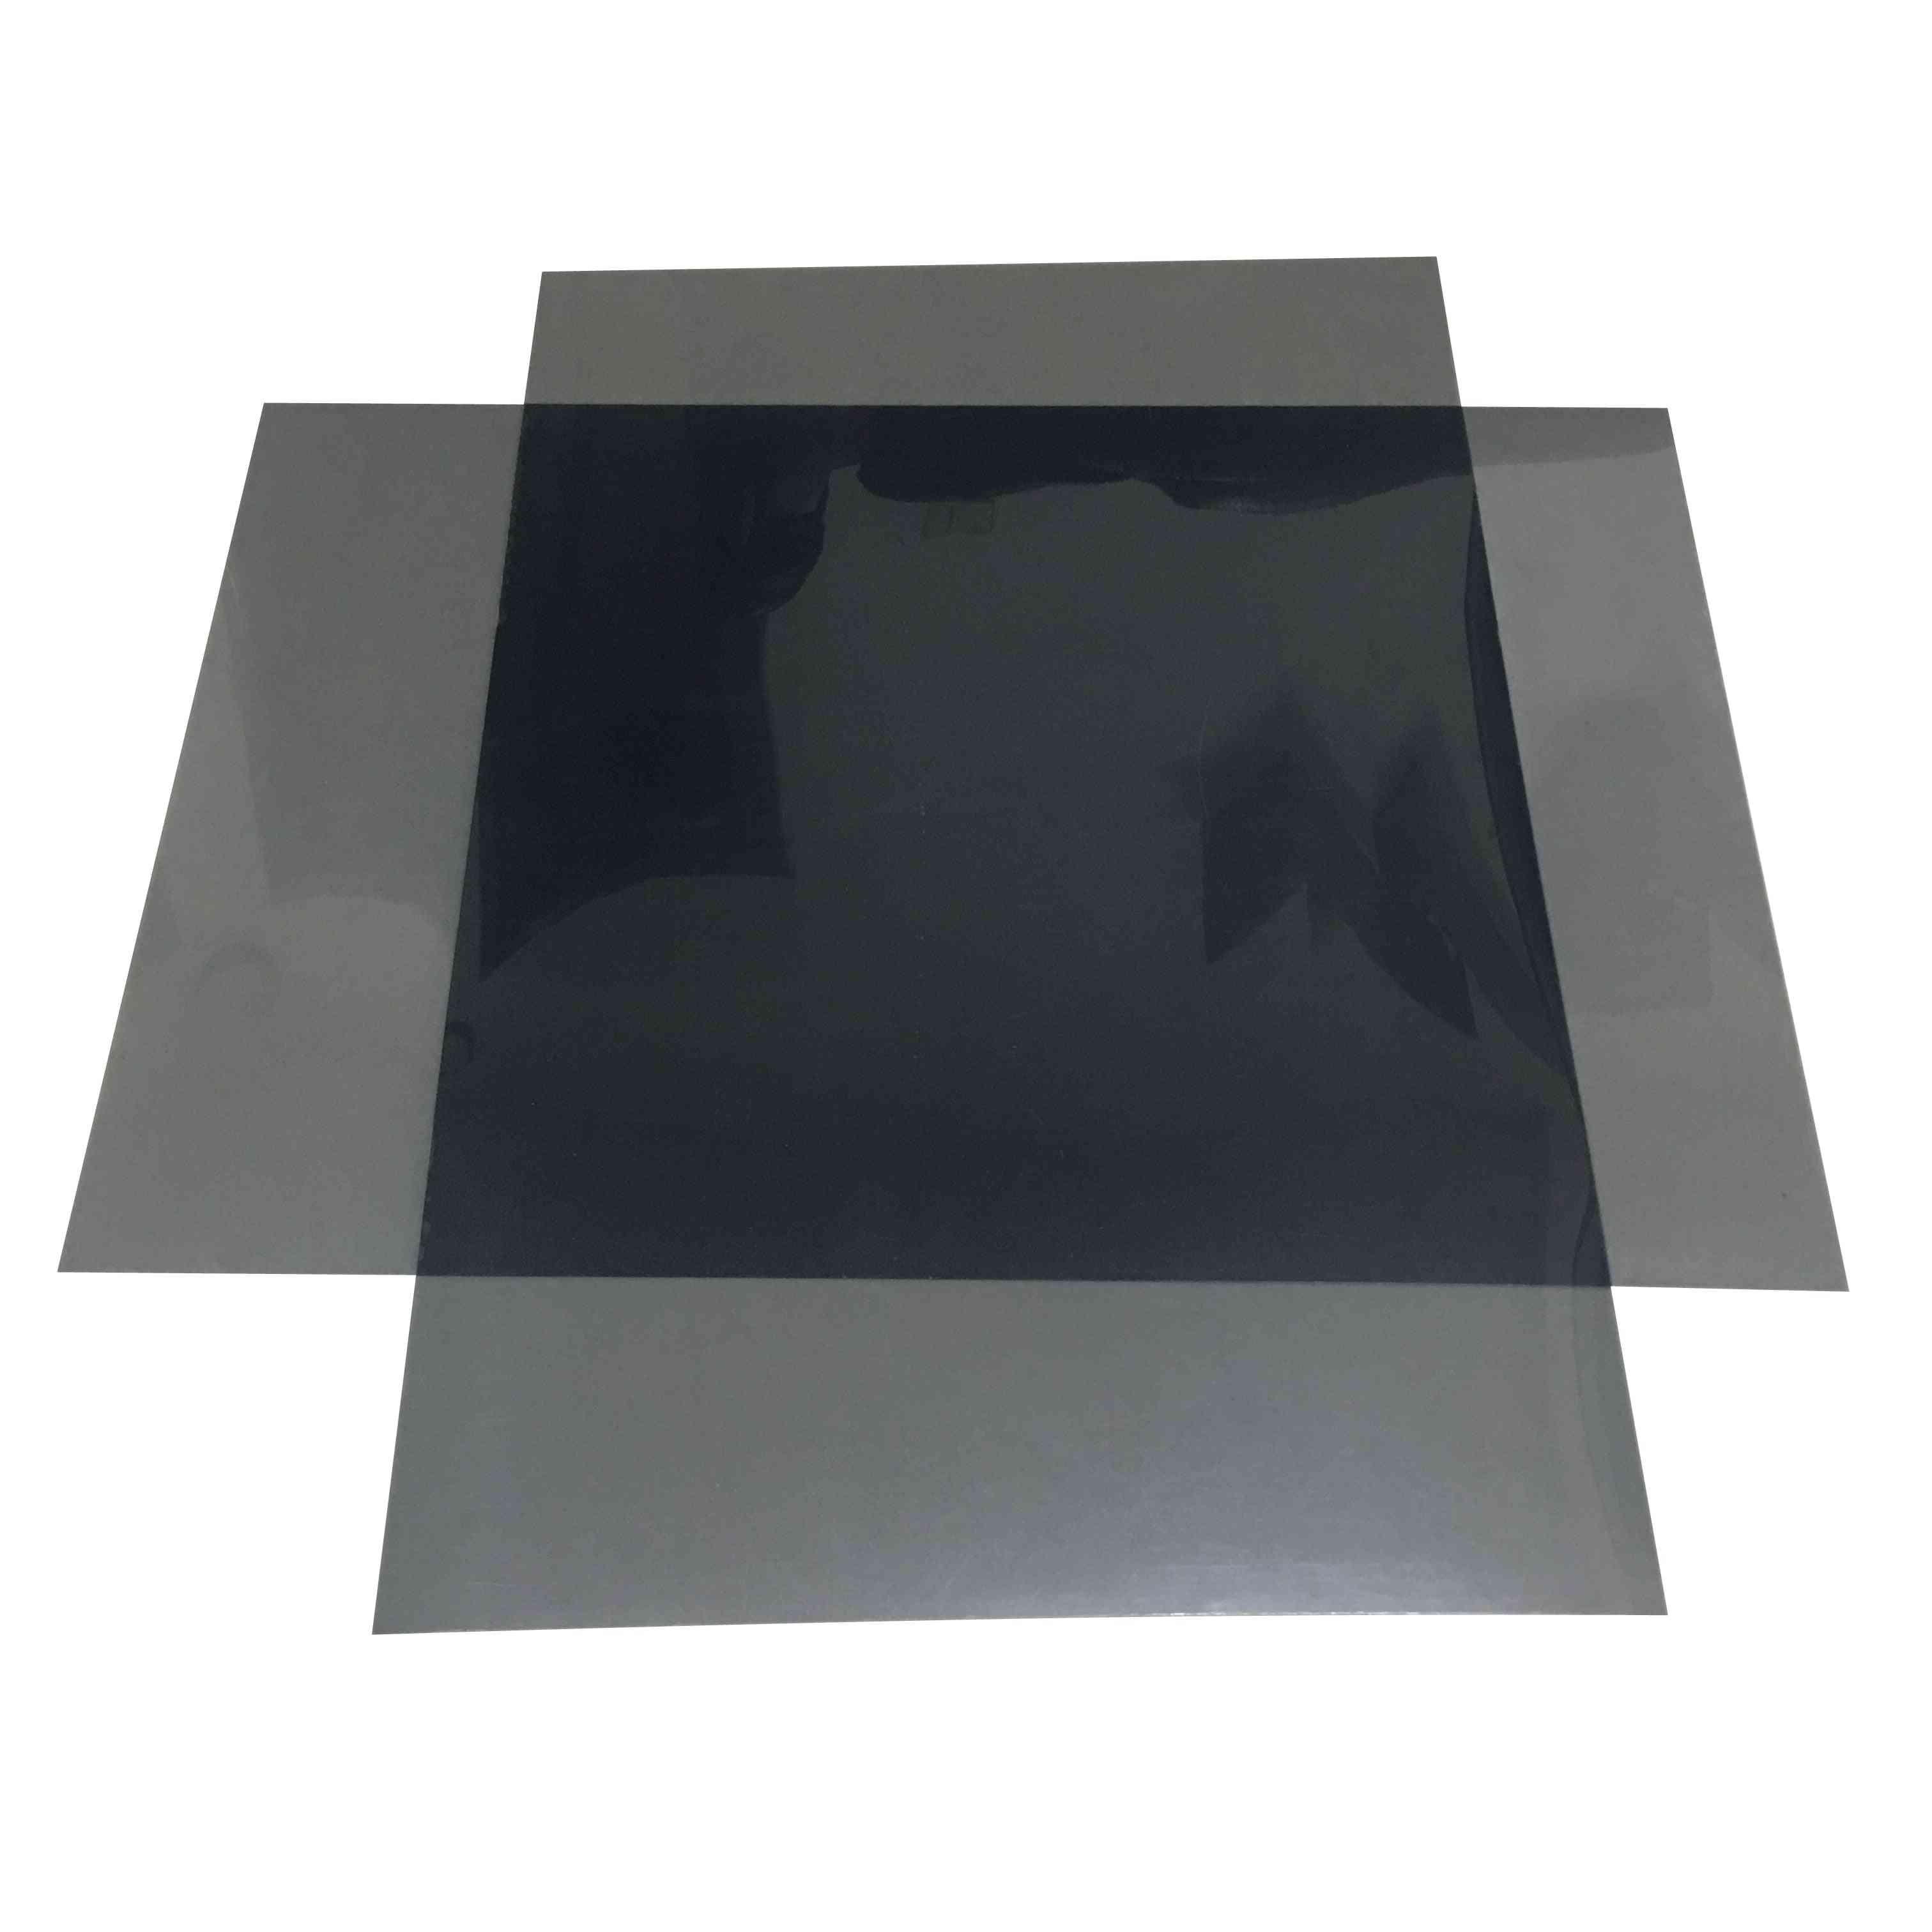 Horizontal0 Degree Linear Polarizer Film